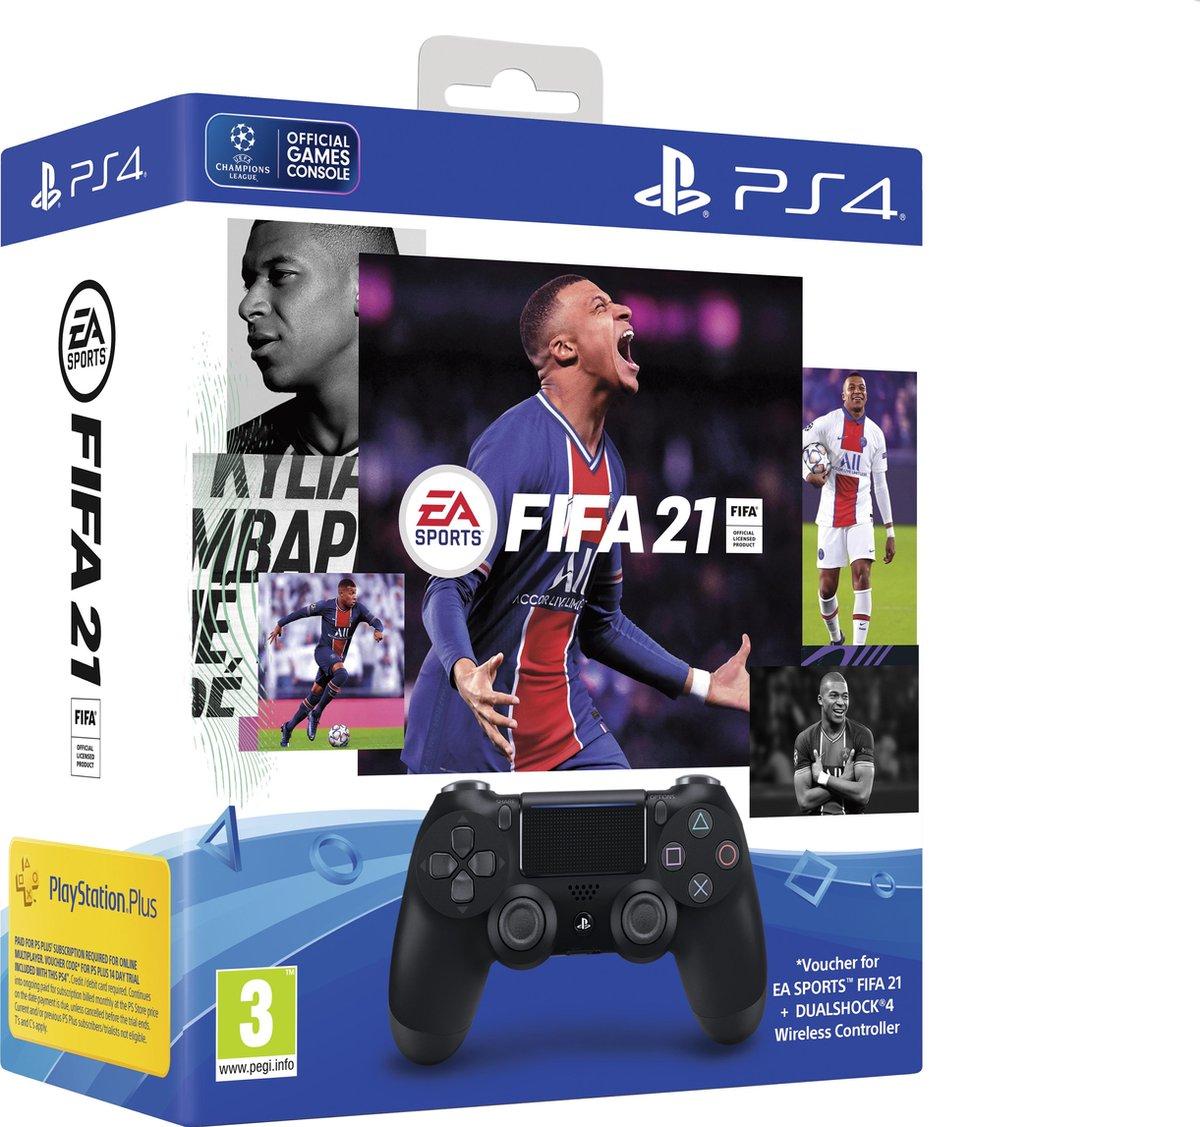 Sony PS4 Wireless Dualshock 4 V2 Controller + FIFA 21 + 14 dagen PlayStation Plus